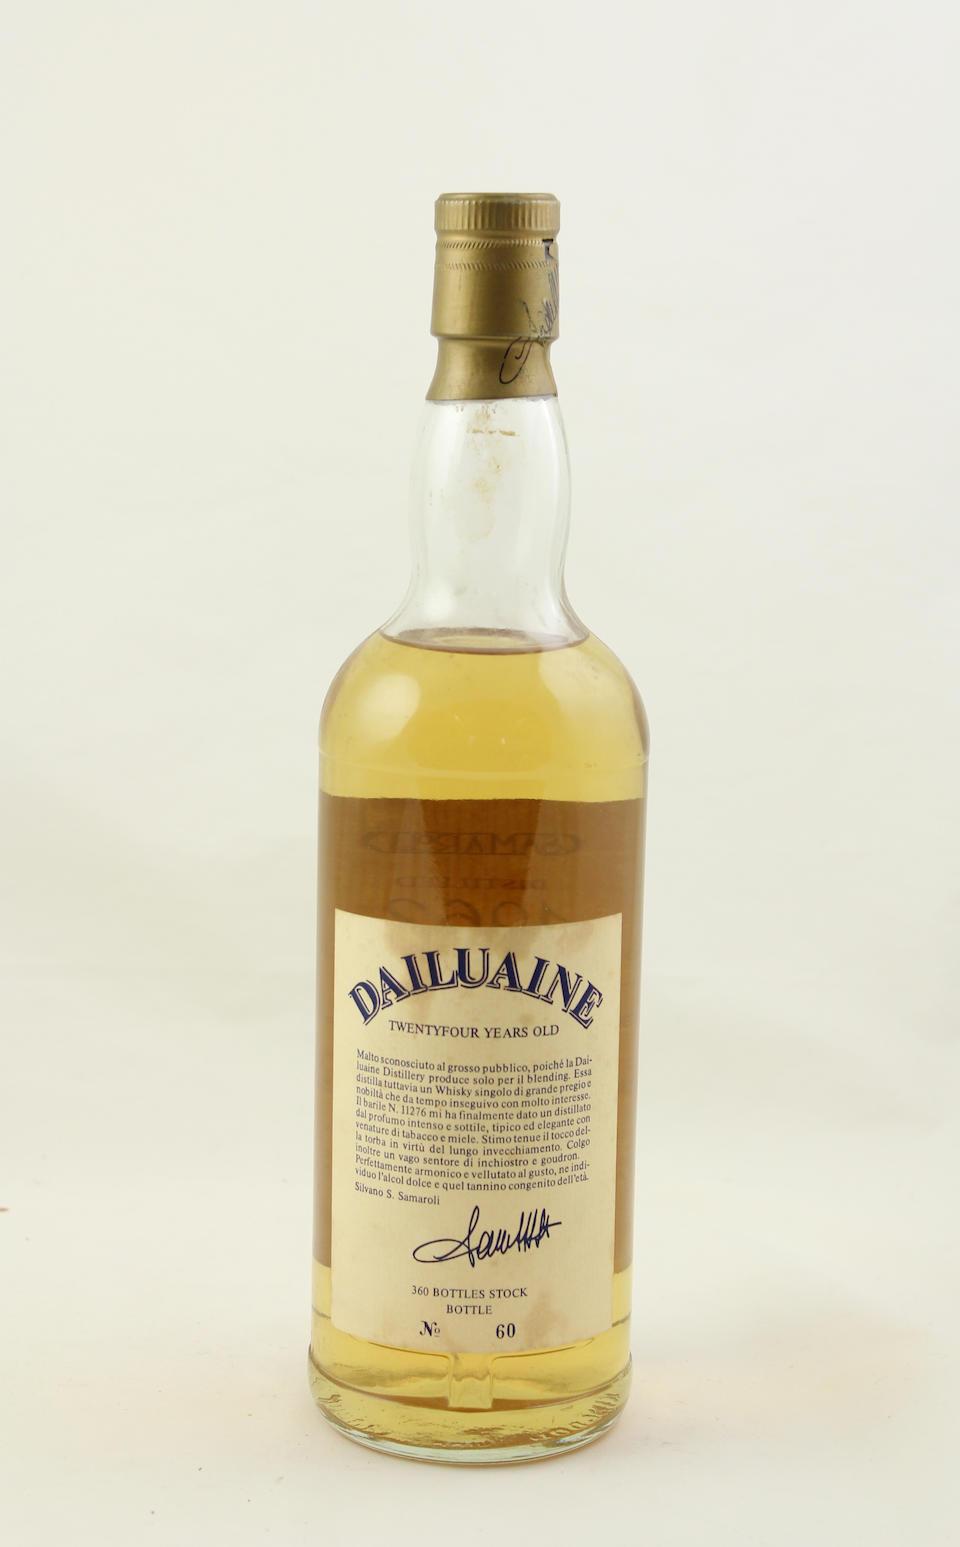 Dailuaine-24 year old-1962